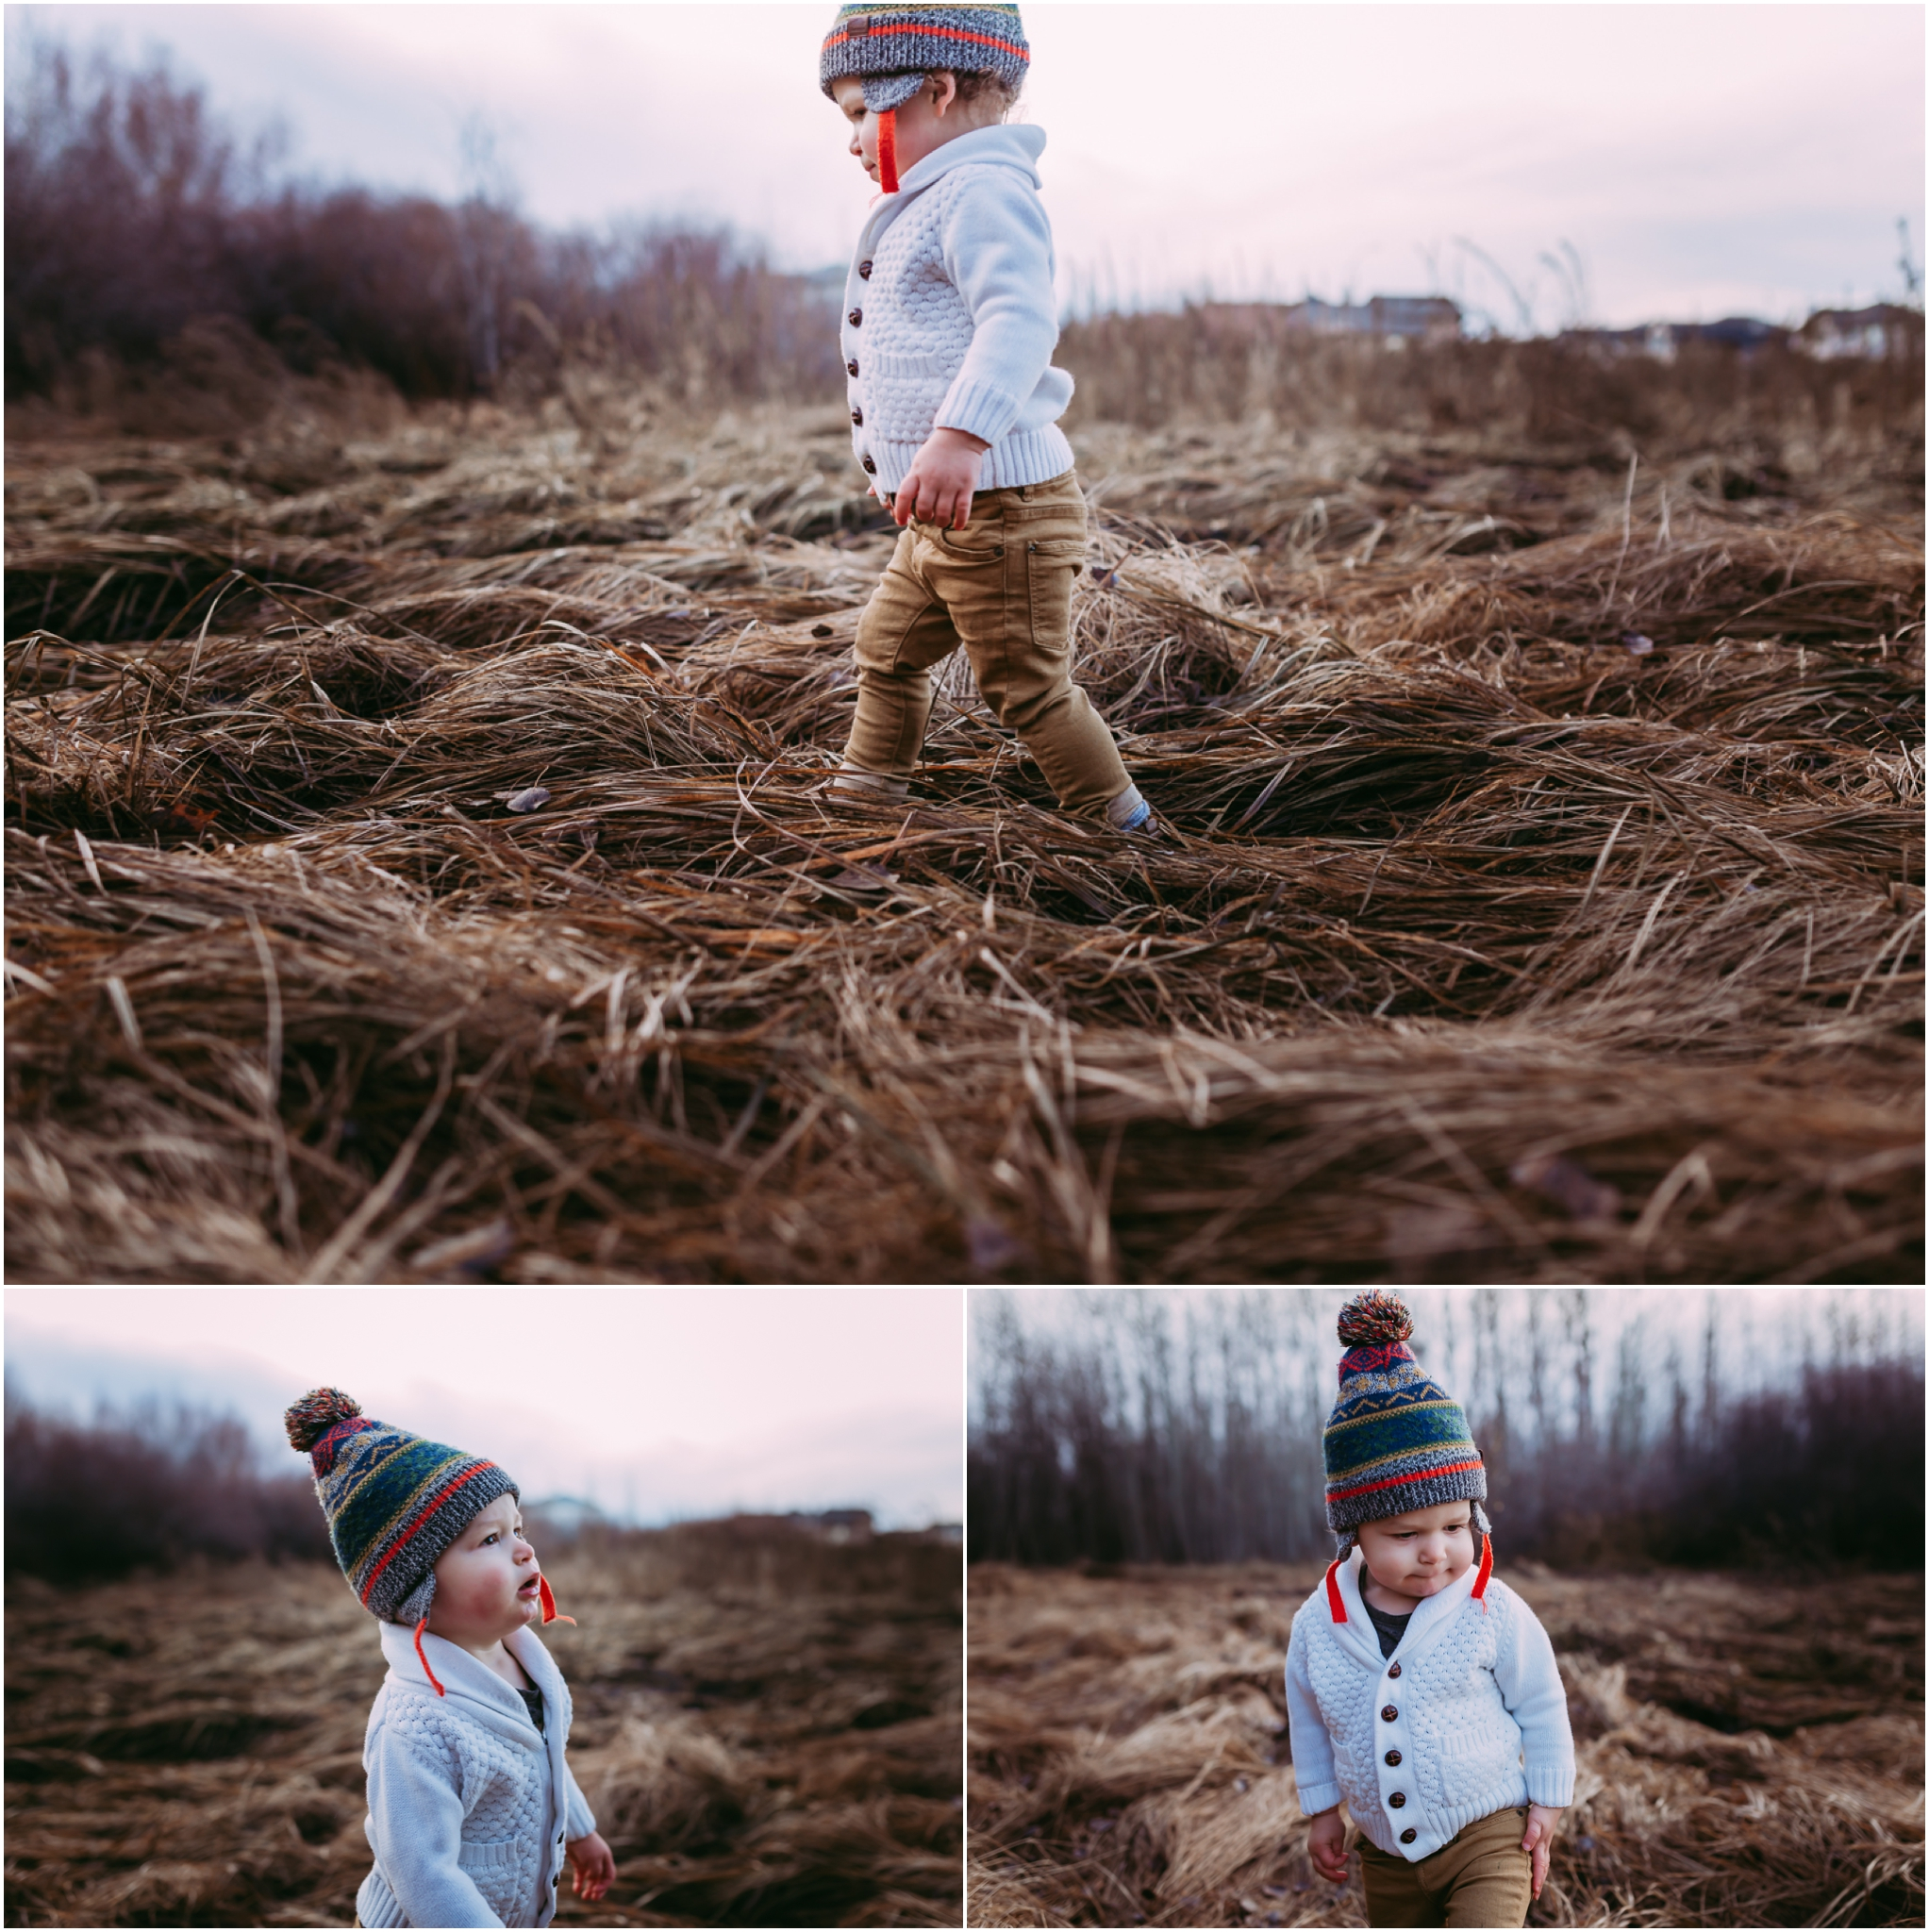 Edmonton Family Photographer - Lifestyle - Best of 2016 - Adventure - Toddler